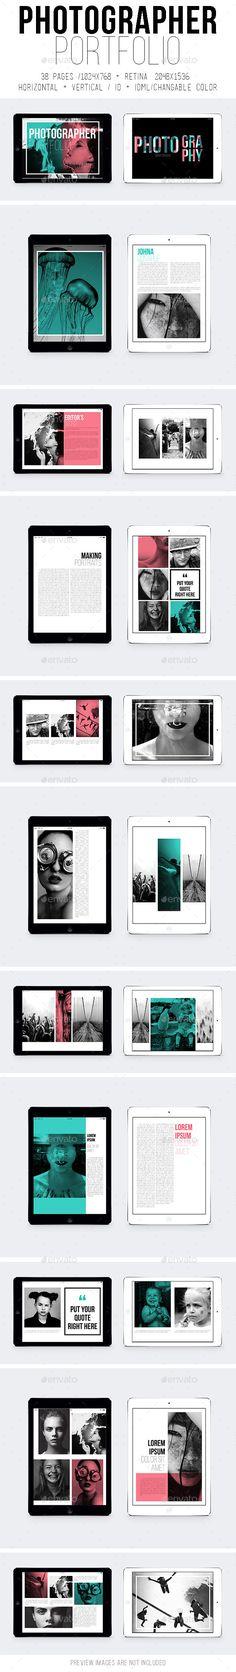 Ipad & Tablet Photographer Portfolio Template #eportfolio #emagazine Download: http://graphicriver.net/item/ipad-tablet-photographer-portfolio/10465263?ref=ksioks